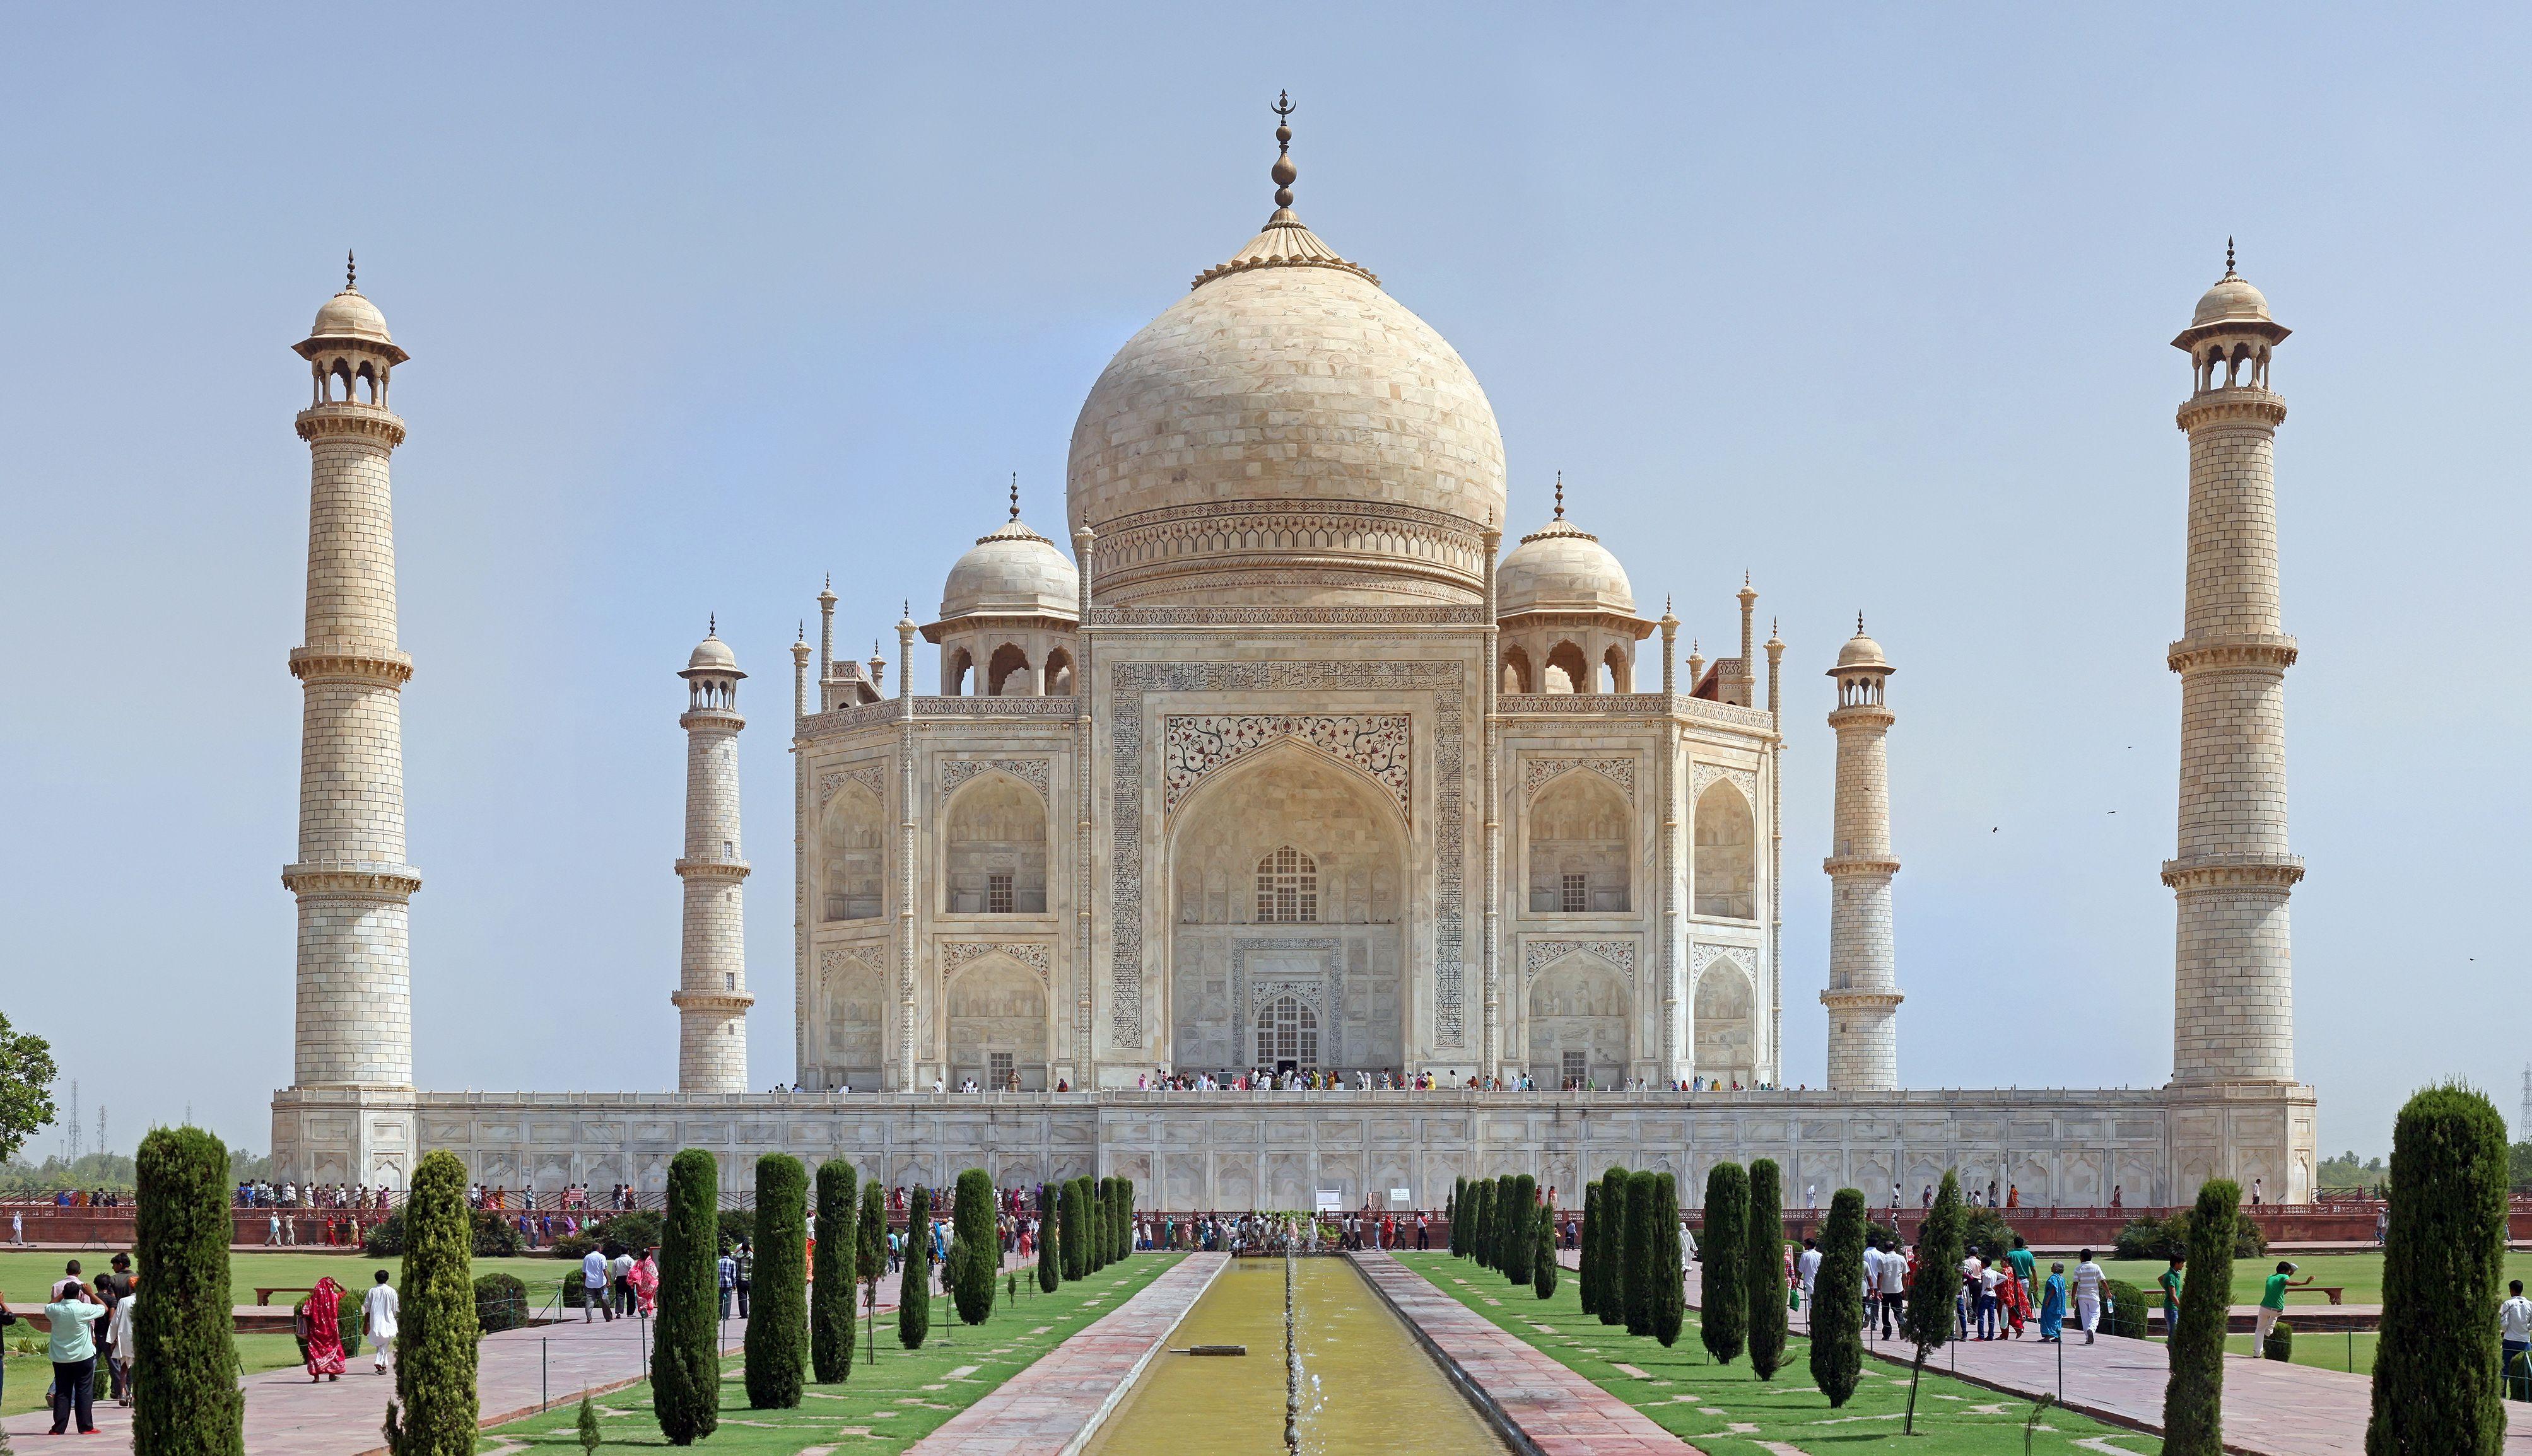 30 world famous buildings to inspire you pinterest taj mahal